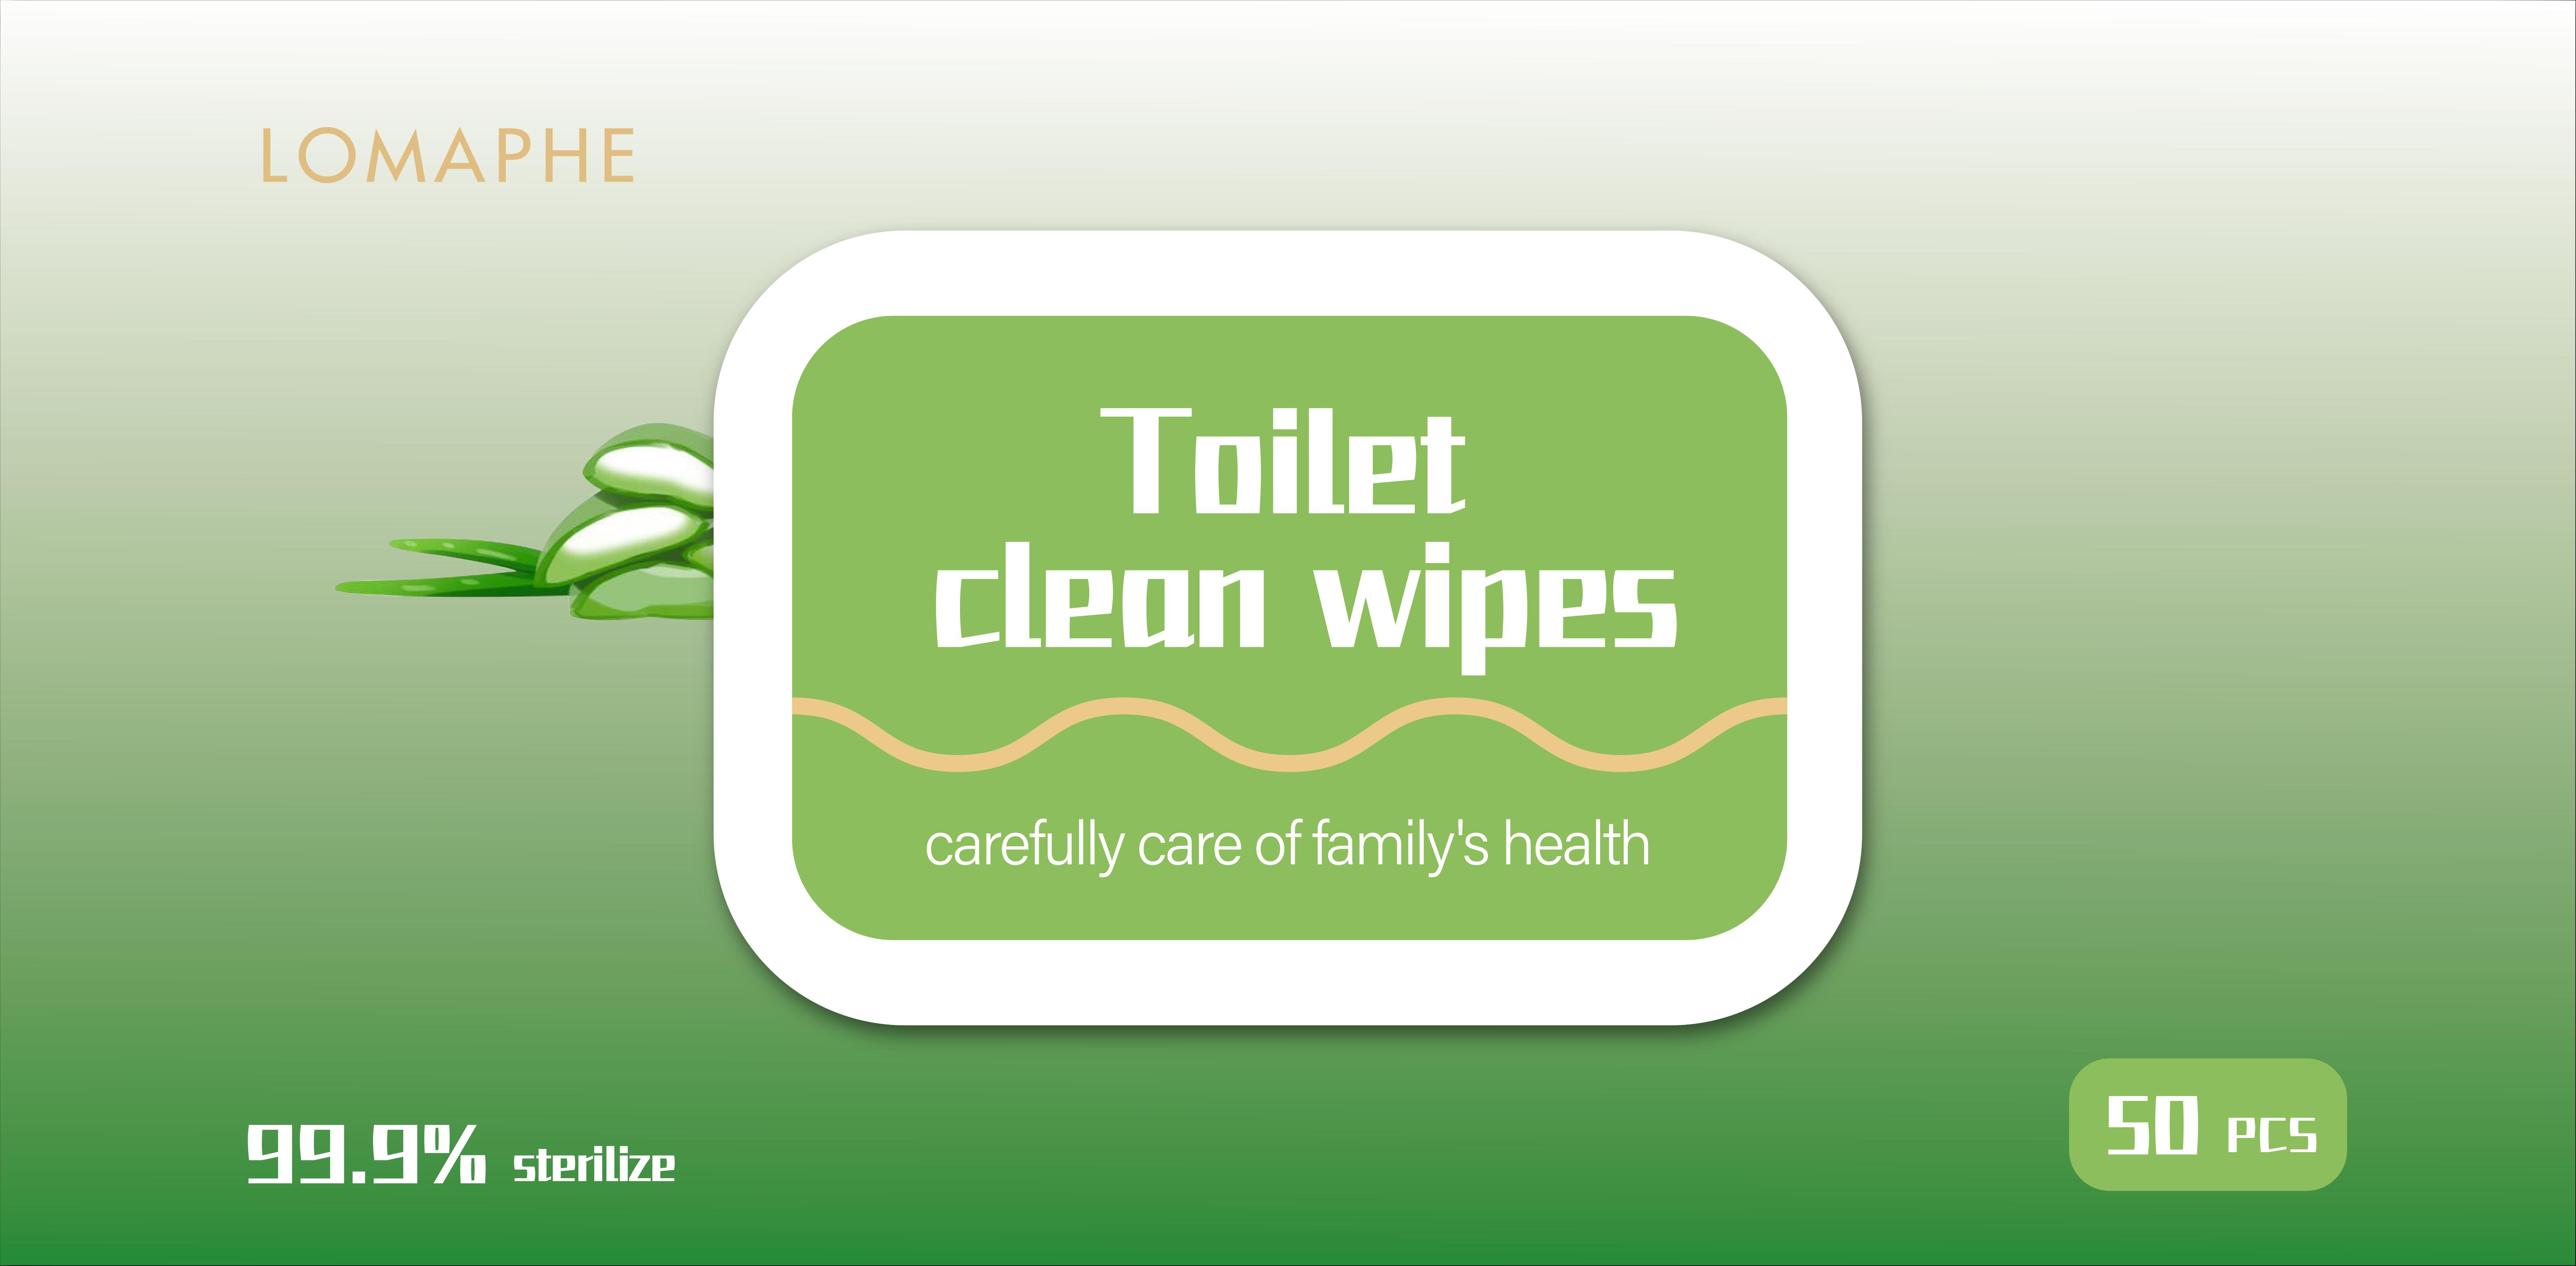 flushable disinfectant toilet wipes